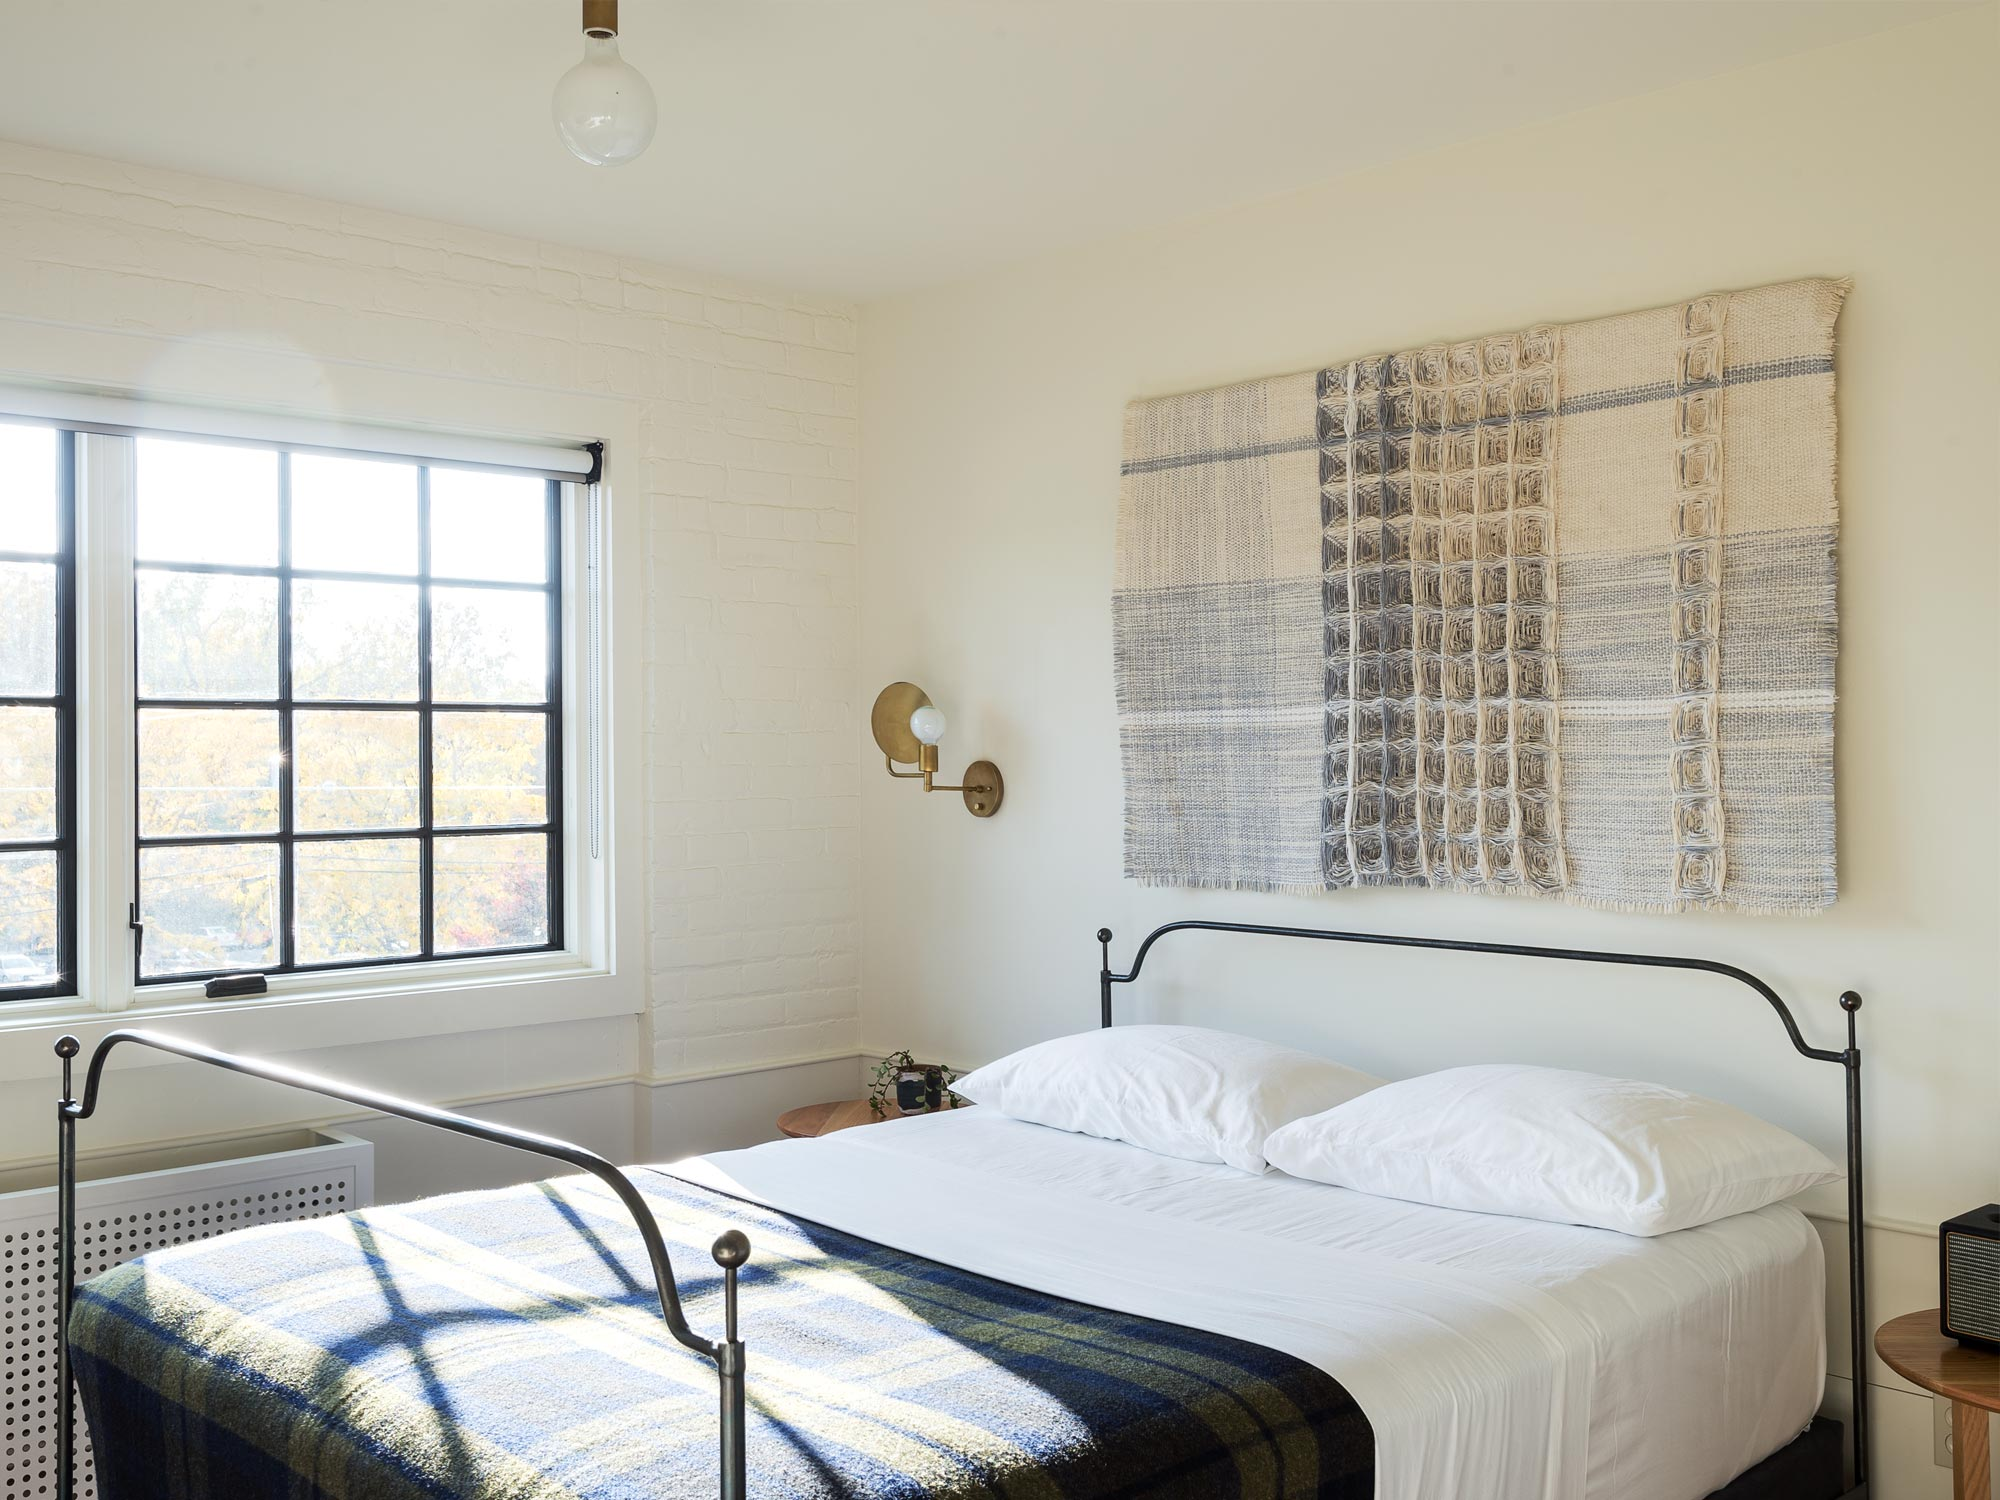 kinfolk-rustic-farmhouse-master-bedroom-decor-workstead